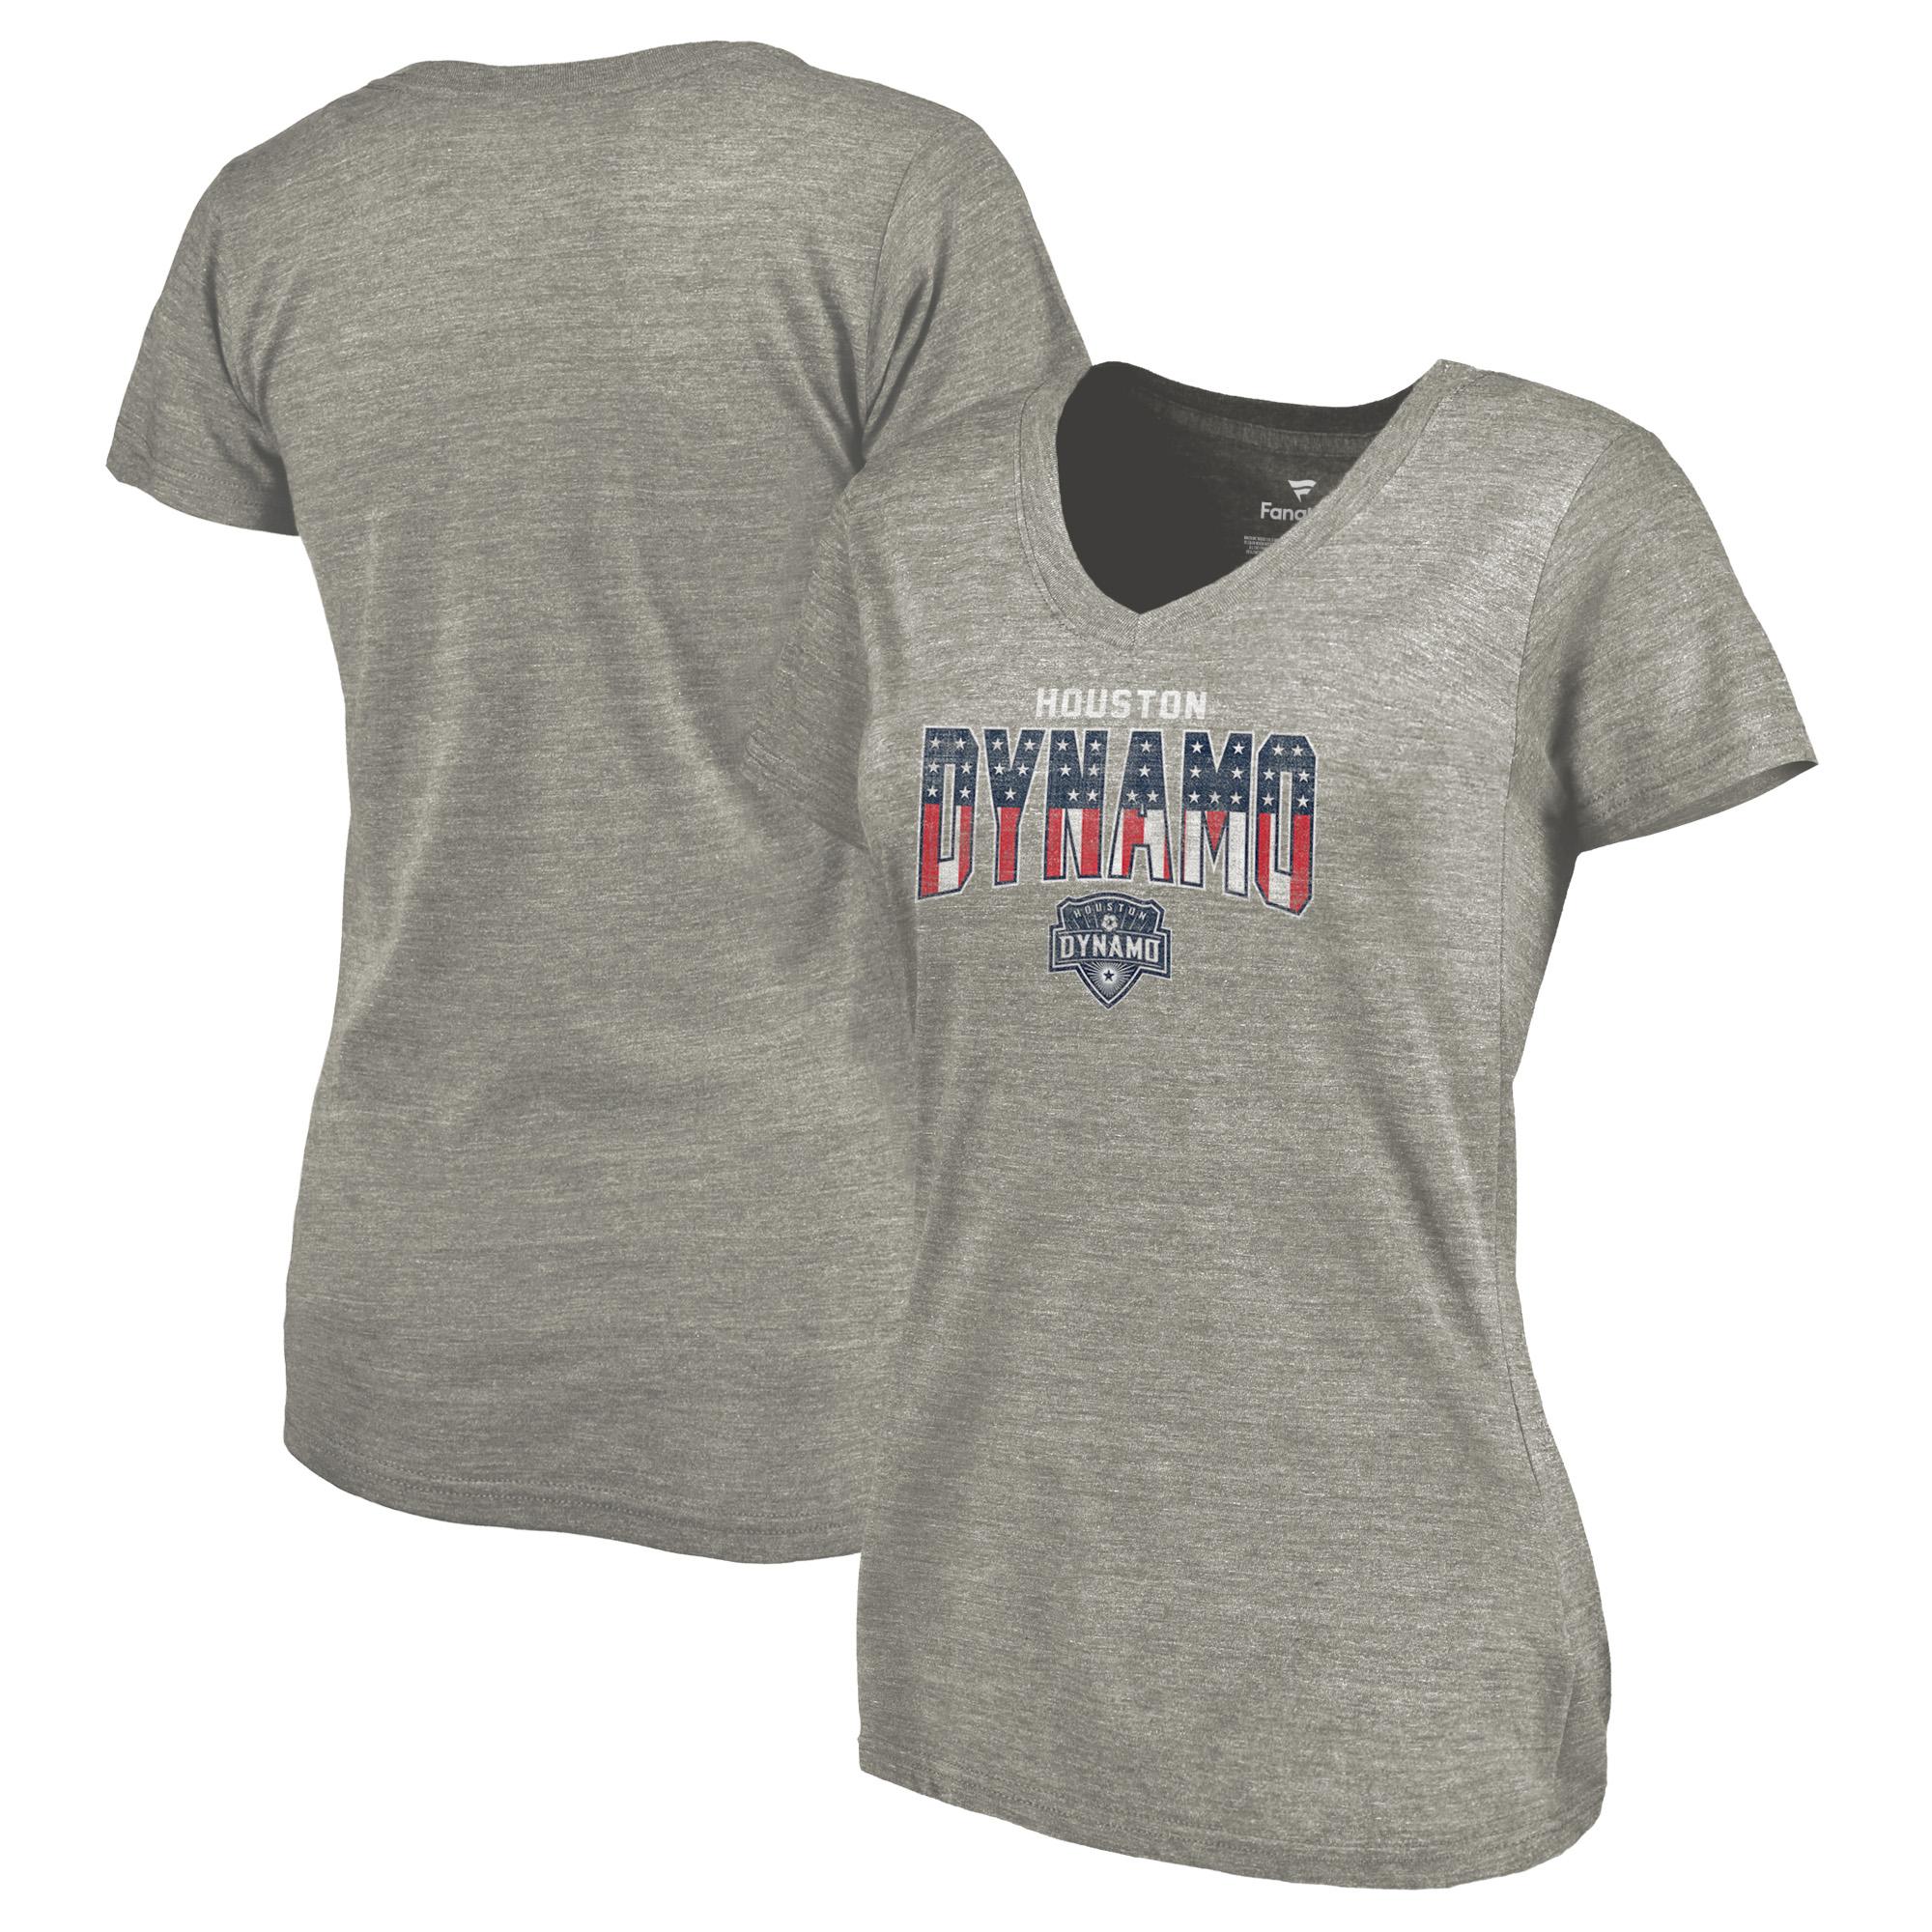 Houston Dynamo Fanatics Branded Women's Freedom Tri-Blend V-Neck T-Shirt - Heathered Gray